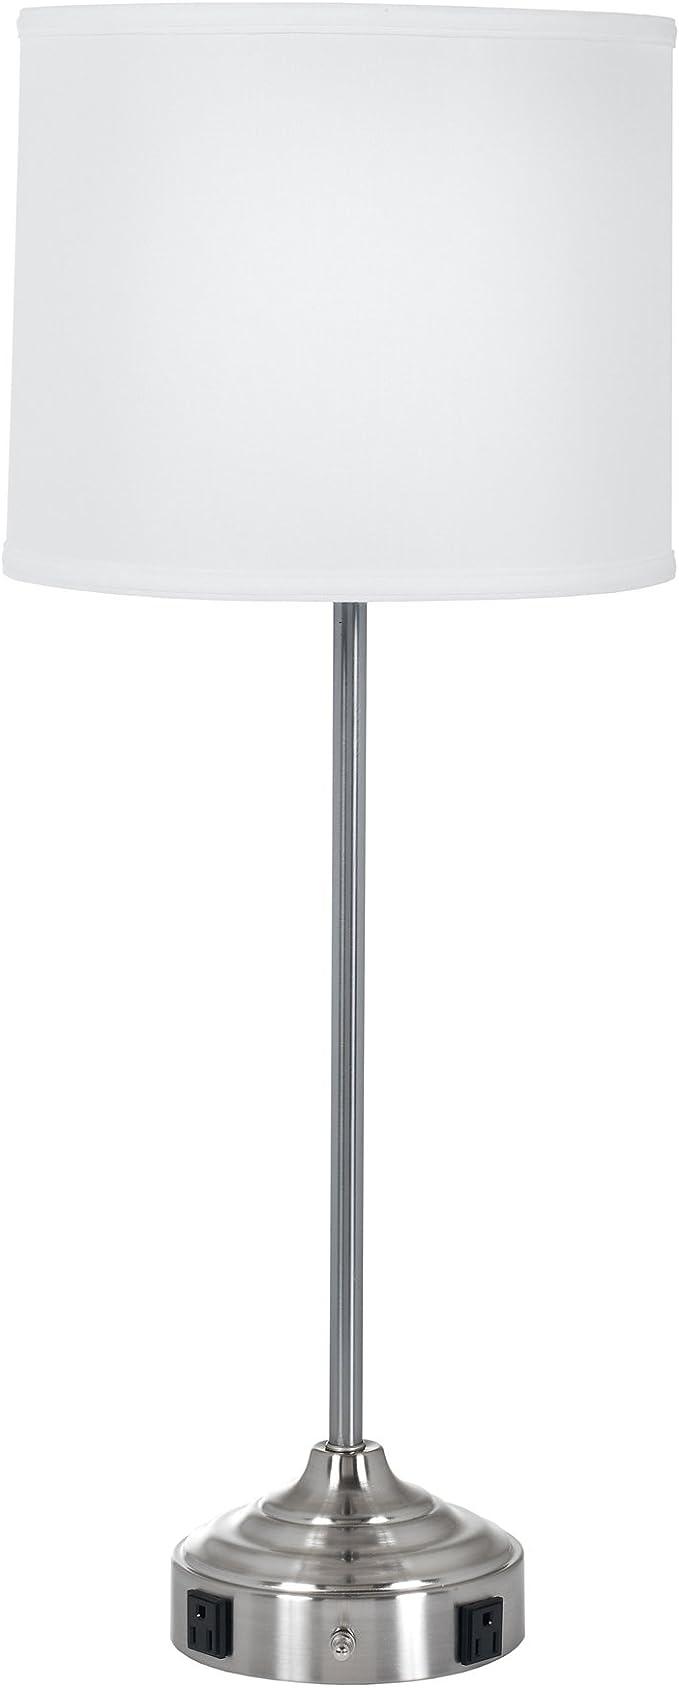 Fangio Lighting W 1064 Table Lamp, 26